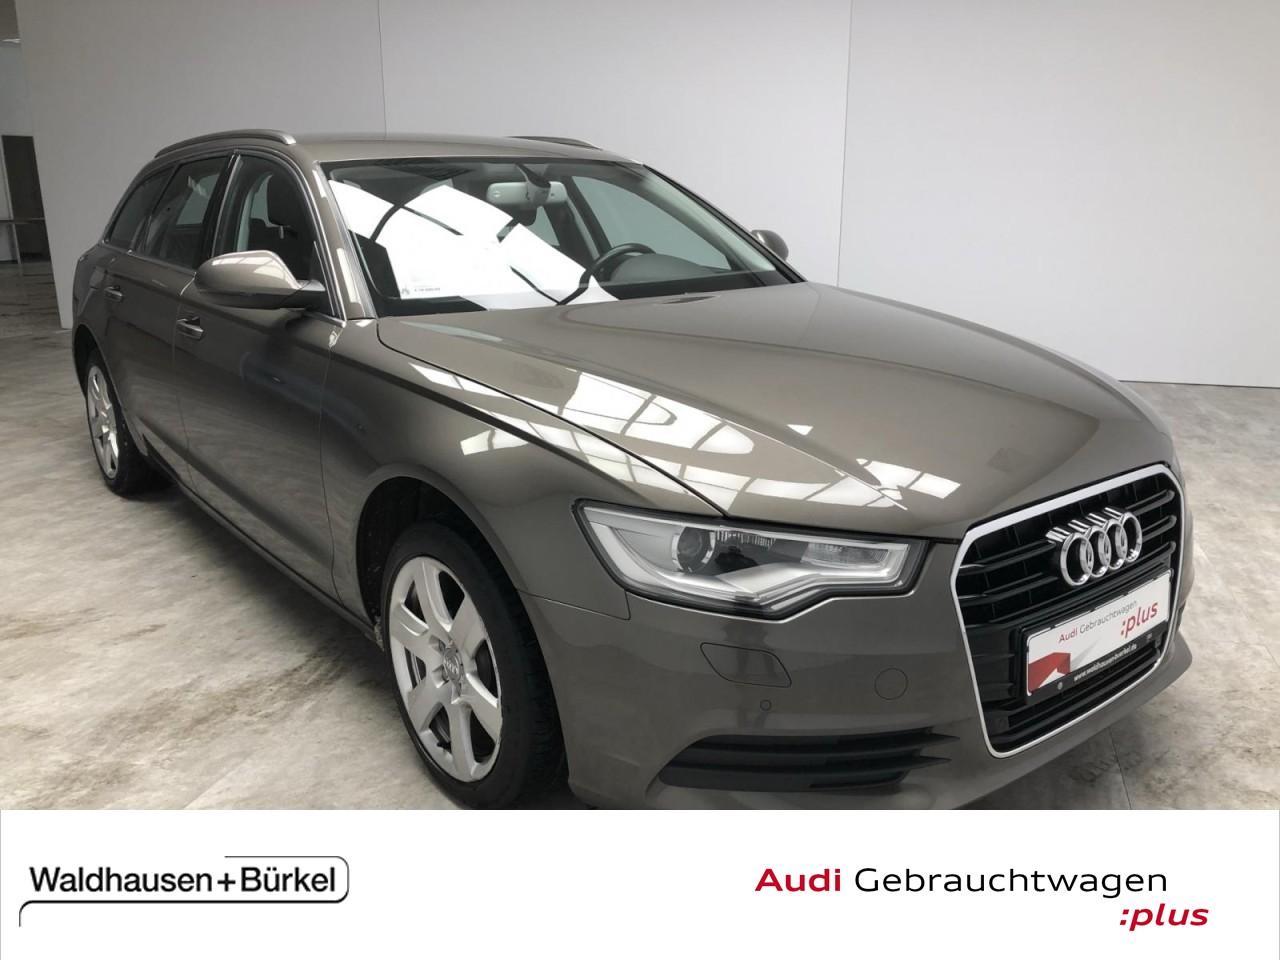 Audi A6 Avant 2.0 TDI Klima Xenon Navi Leder, Jahr 2013, Diesel